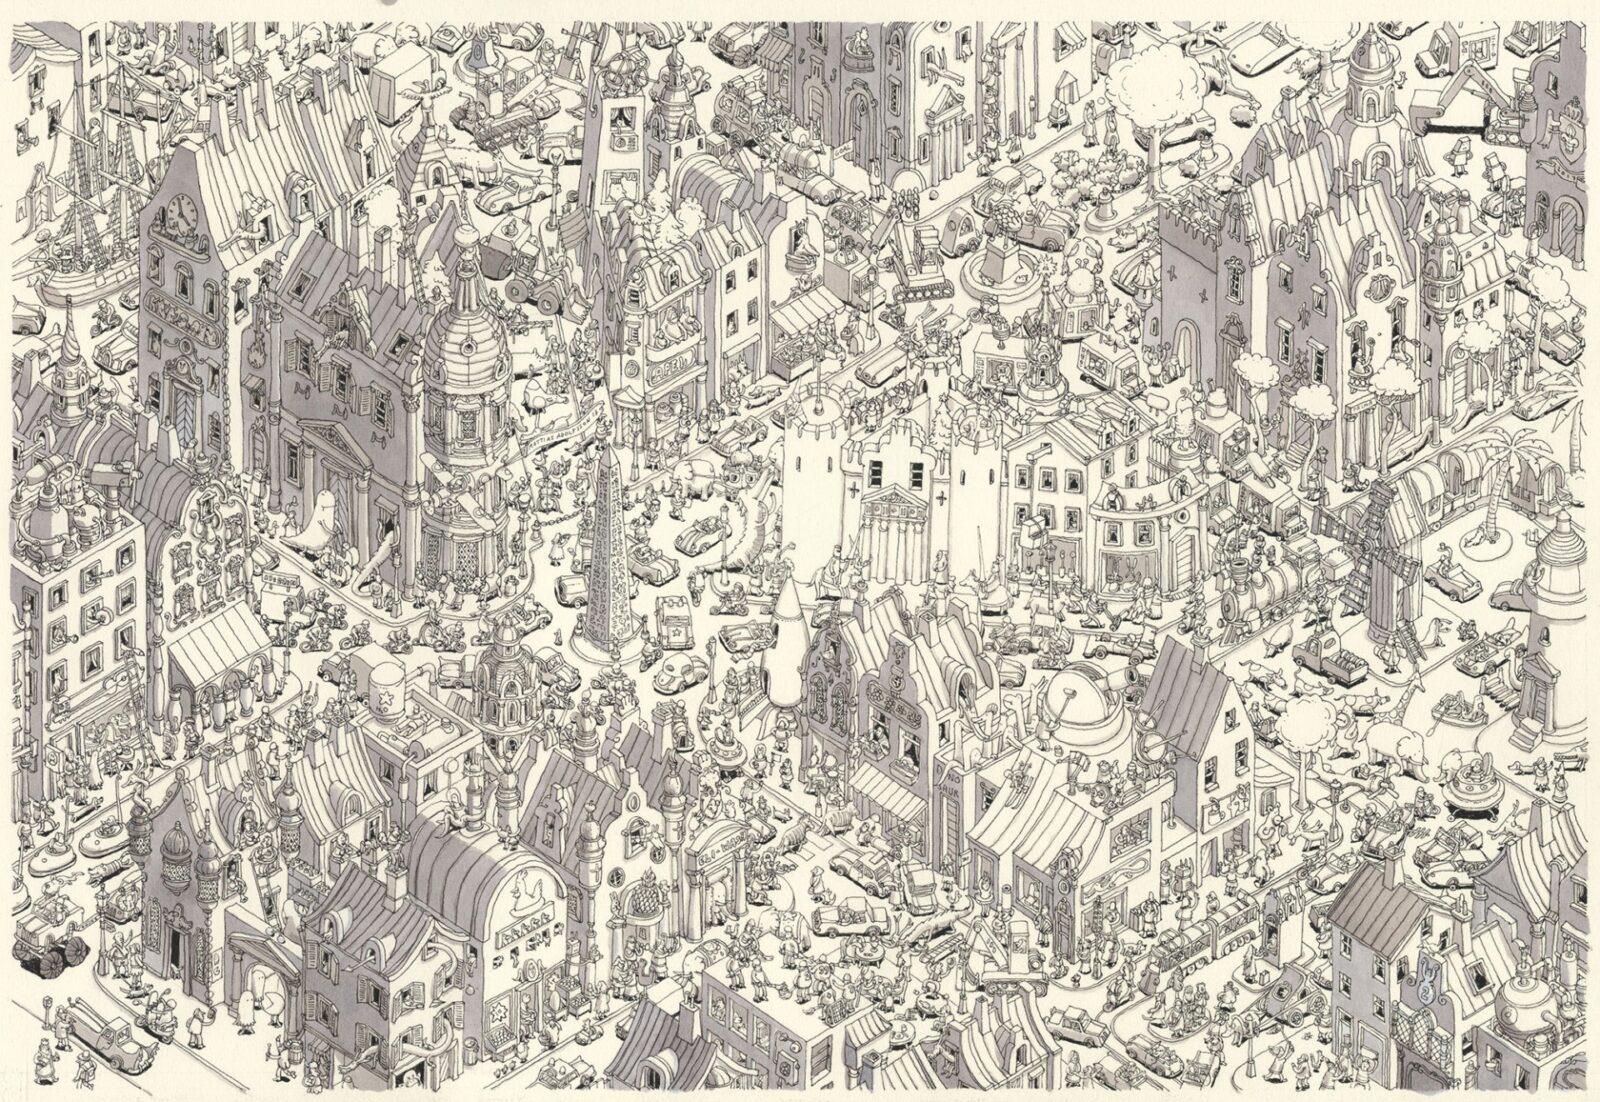 Wonders of Detailing: Art By Matthias Adolfsson